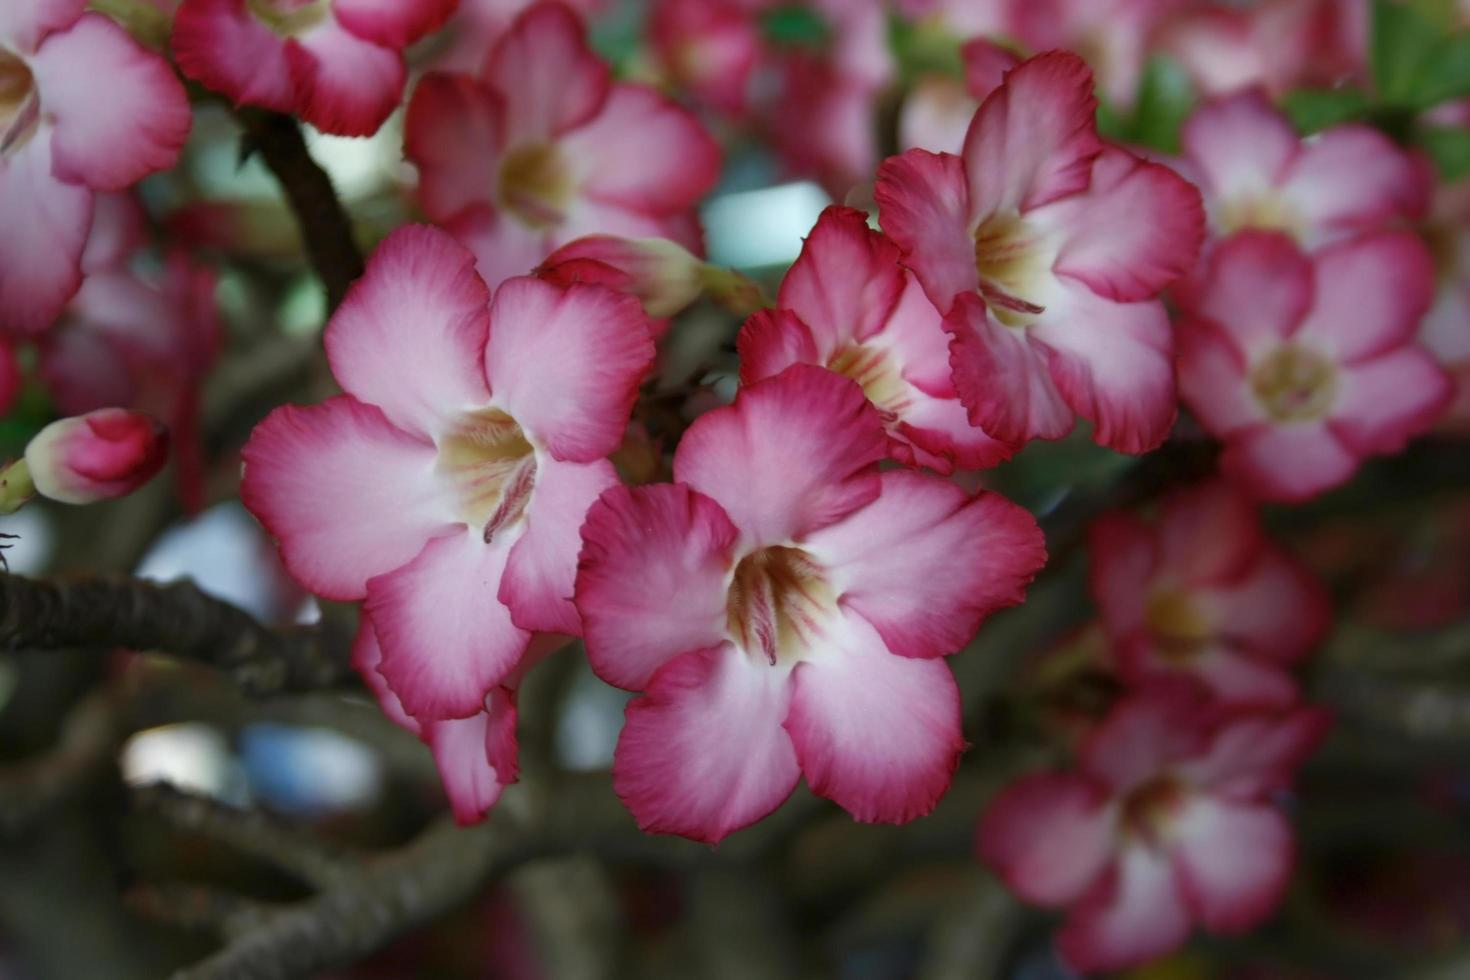 rosa Azaleenblüten draußen foto